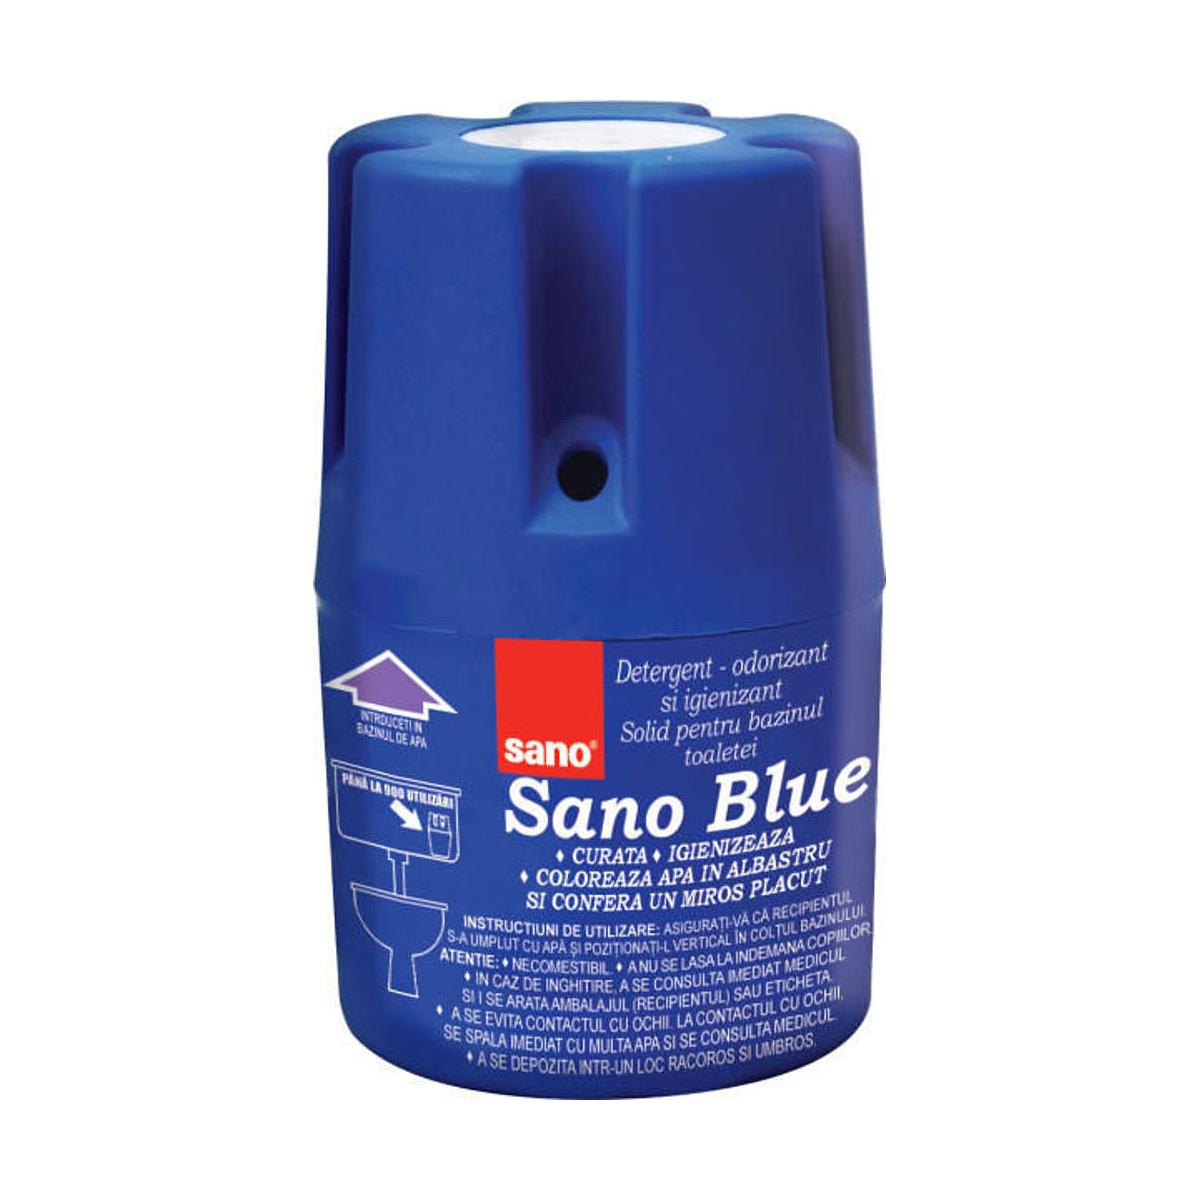 Odorizant Solid Pentru Bazin WC, 150 Grame, Blue Flash, Sano, 287607